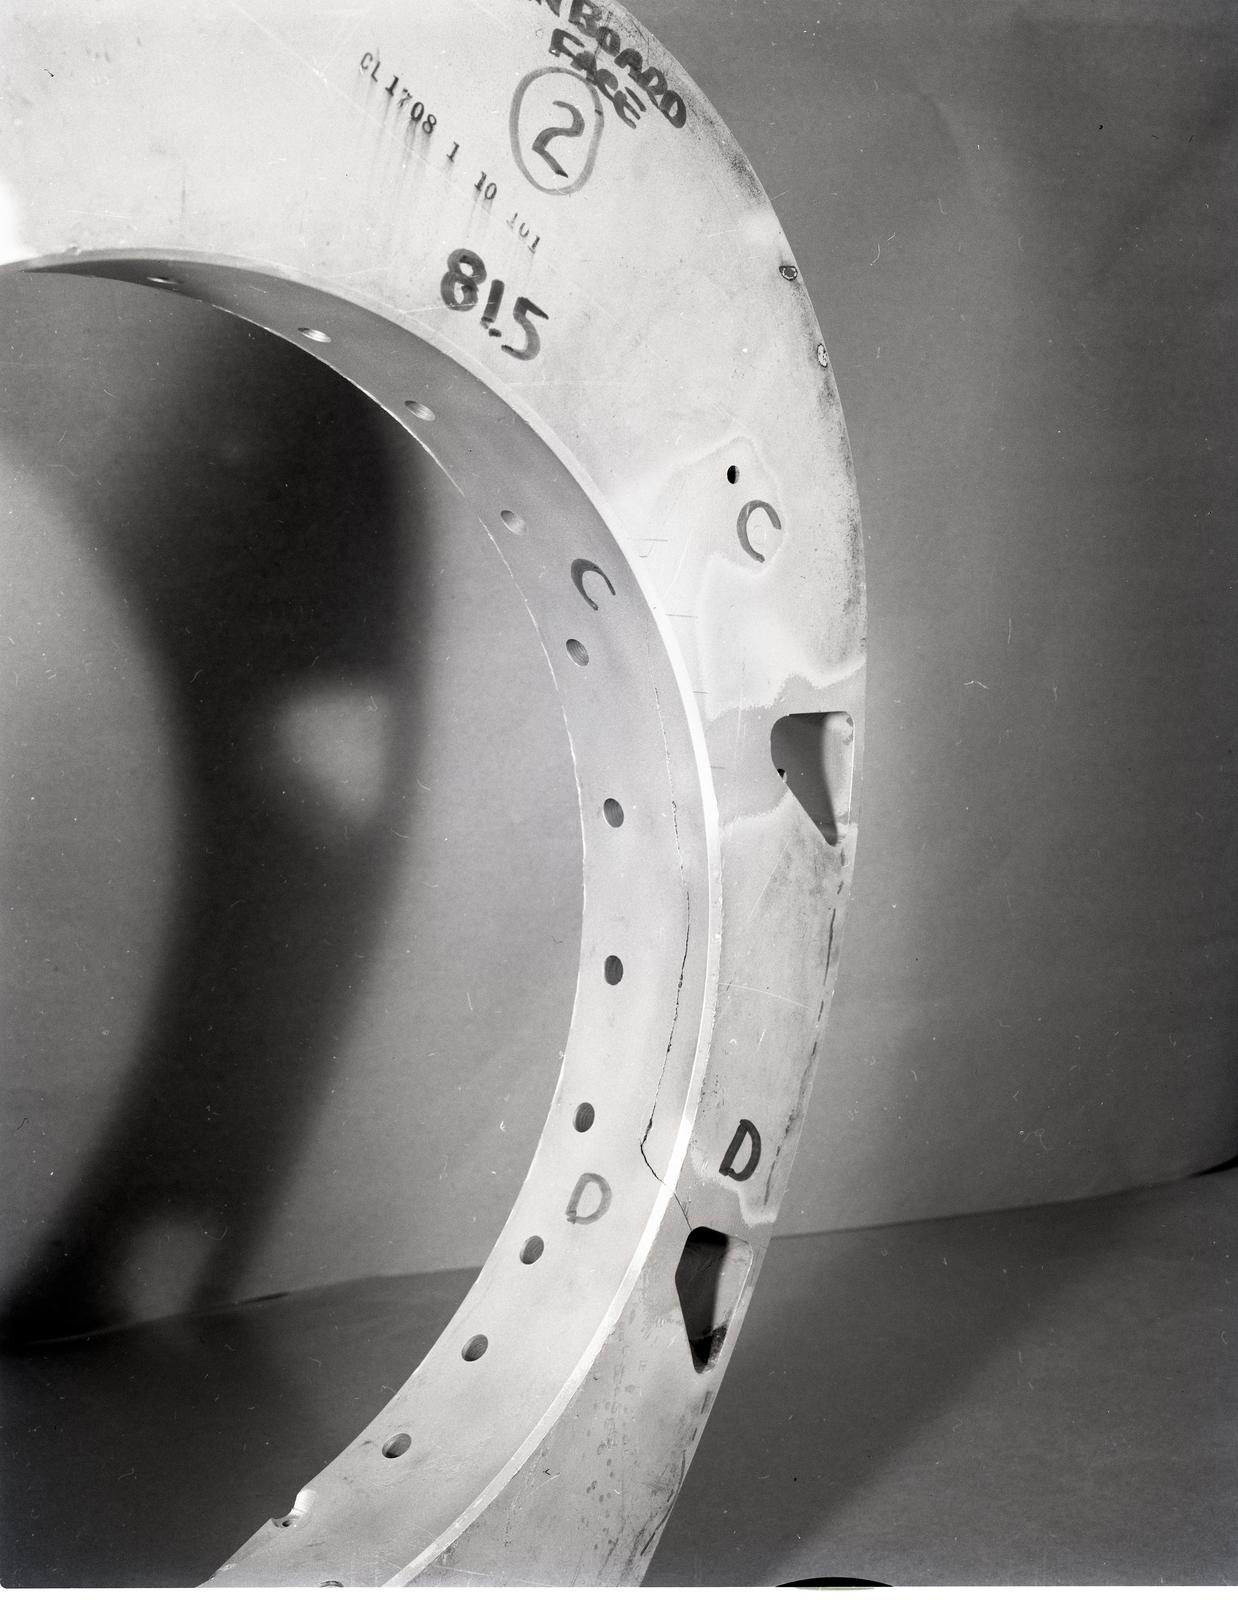 MACHINE SHOP - VARIOUS HUB PARTS AND BEARINGS - STA 81.5 RIB ON THE MOD-O WIND TURBINE BLADE